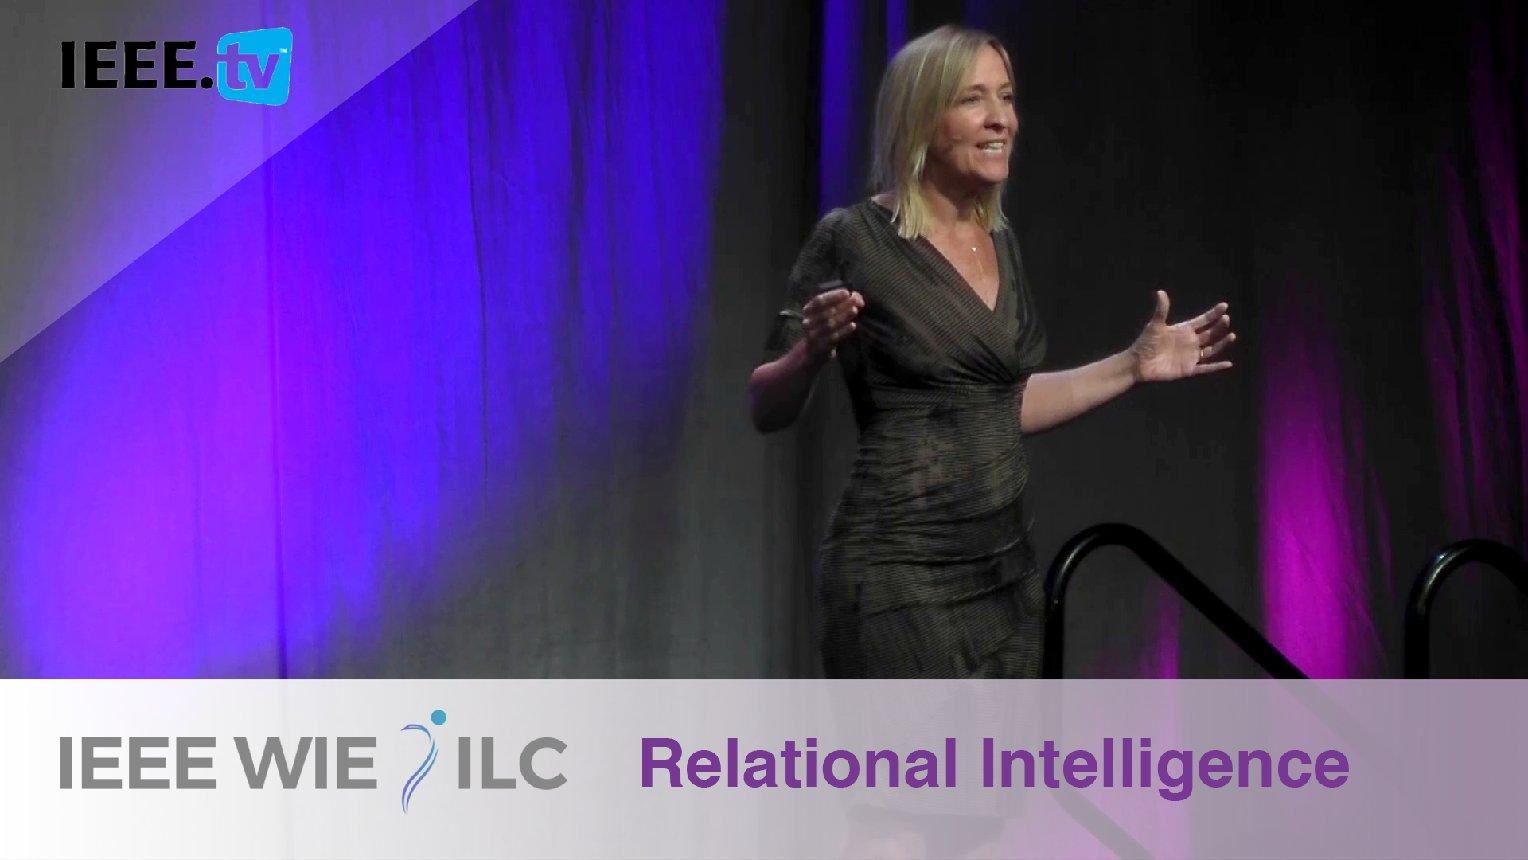 Relational Intelligence with Keynote Kerena Saltzman - IEEE WIE ILC 2017